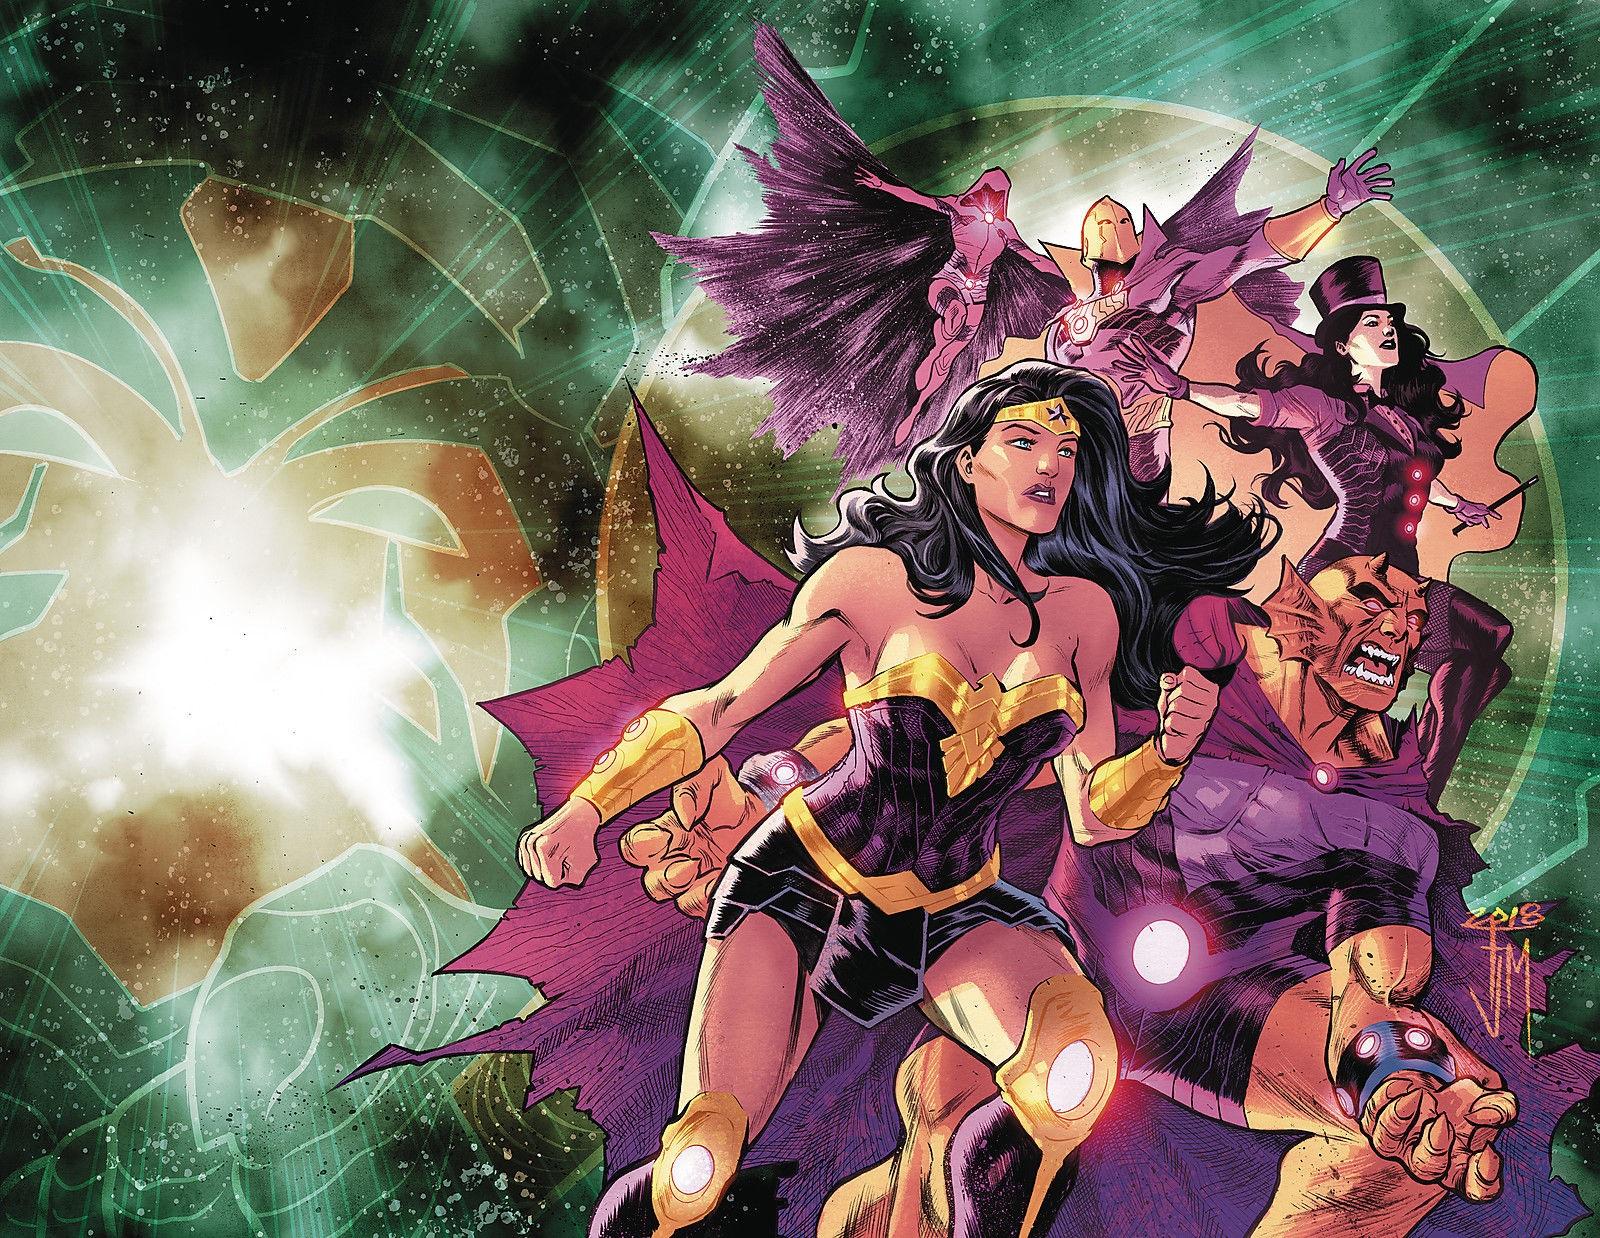 Justice League: Team Wonder